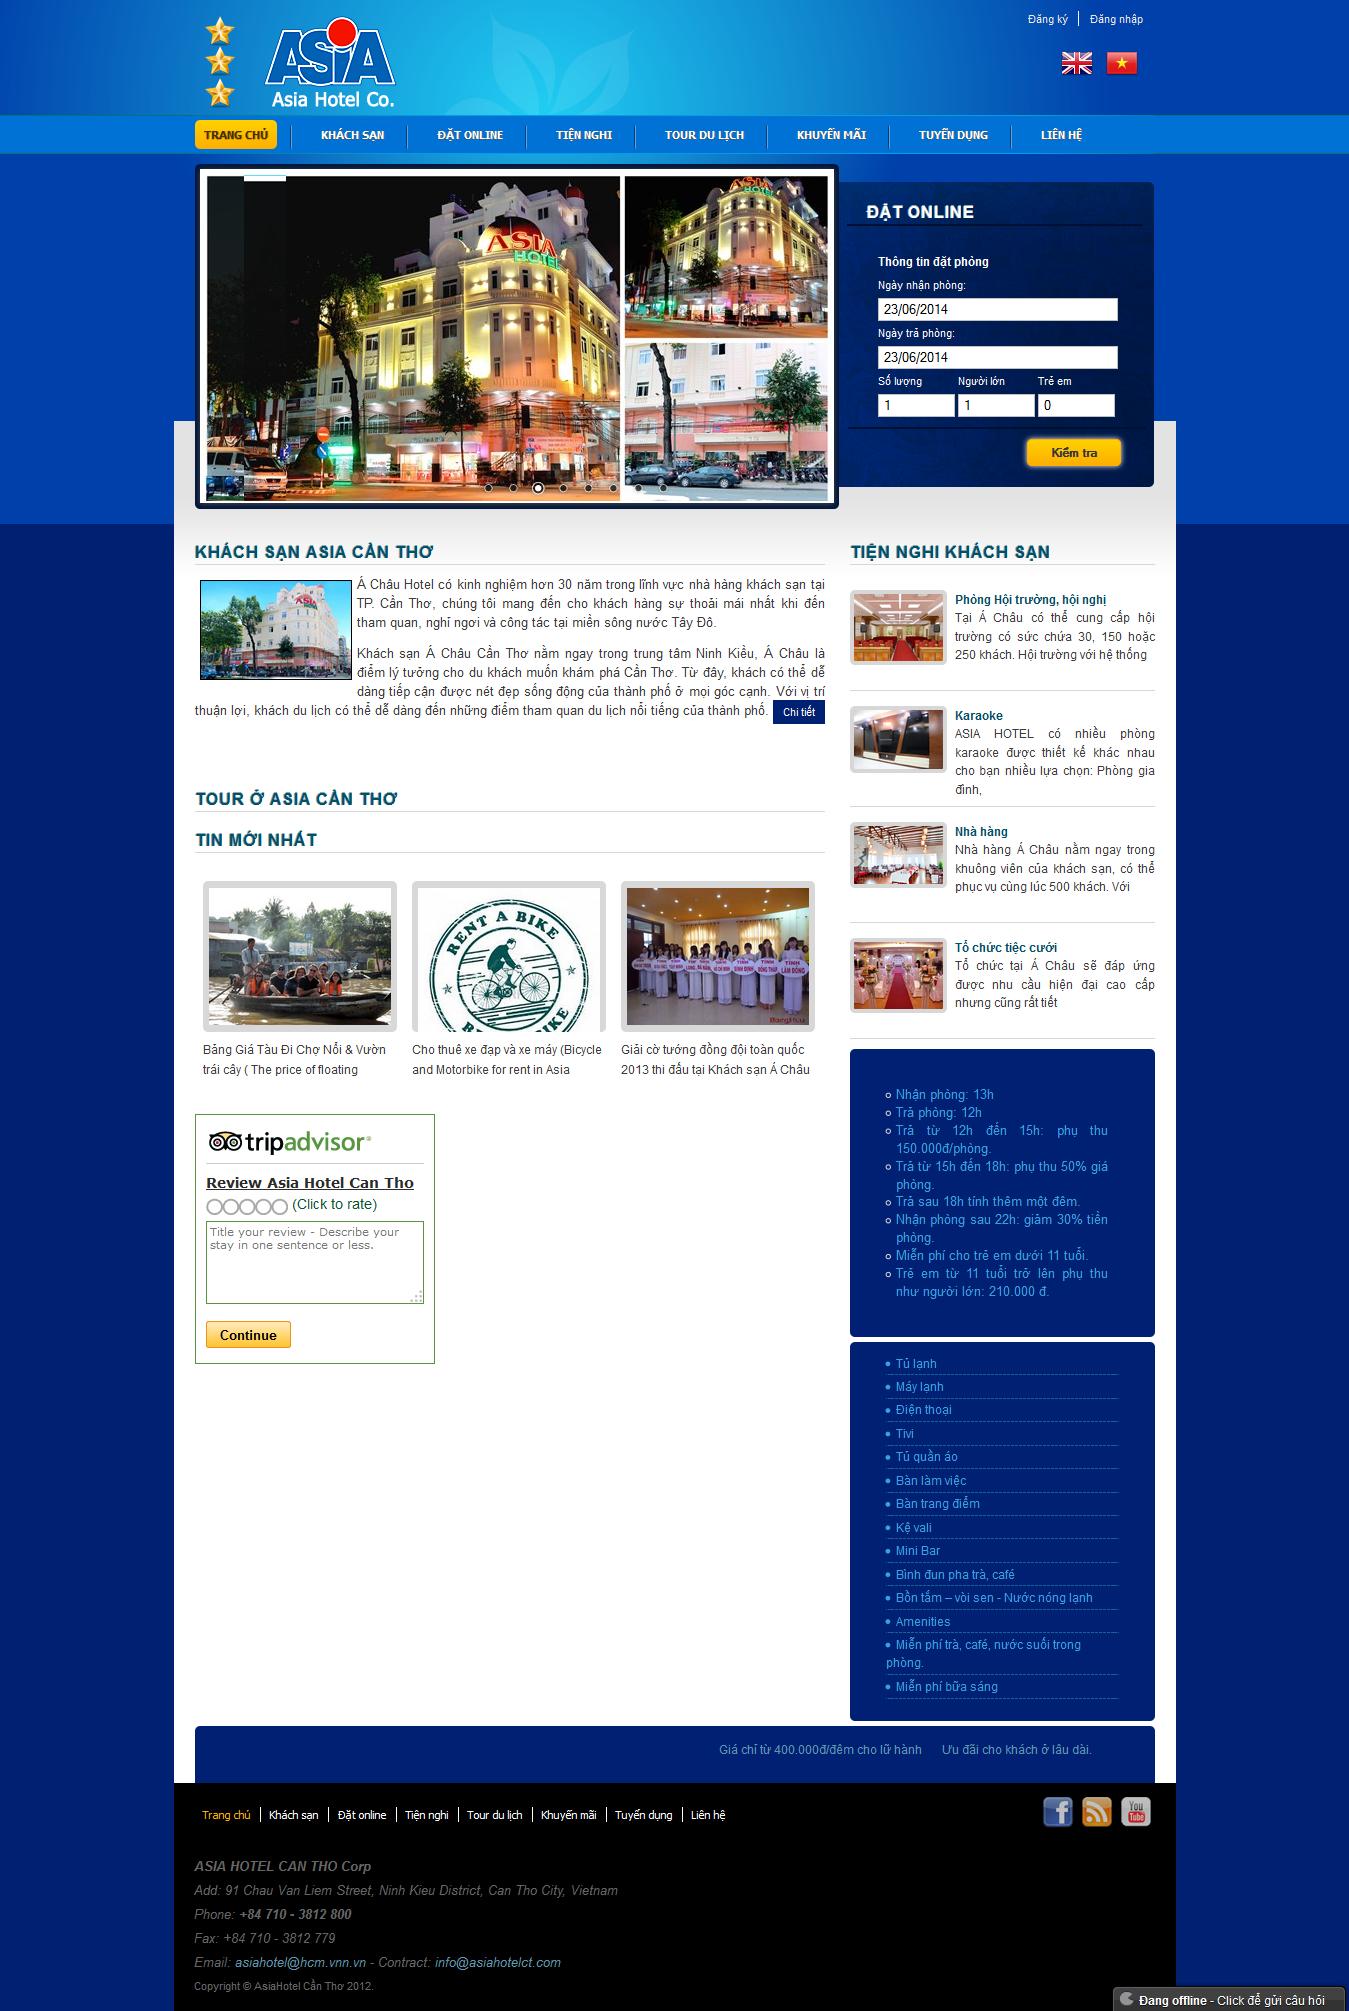 Mẫu website giới thiệu khach sạn 10223